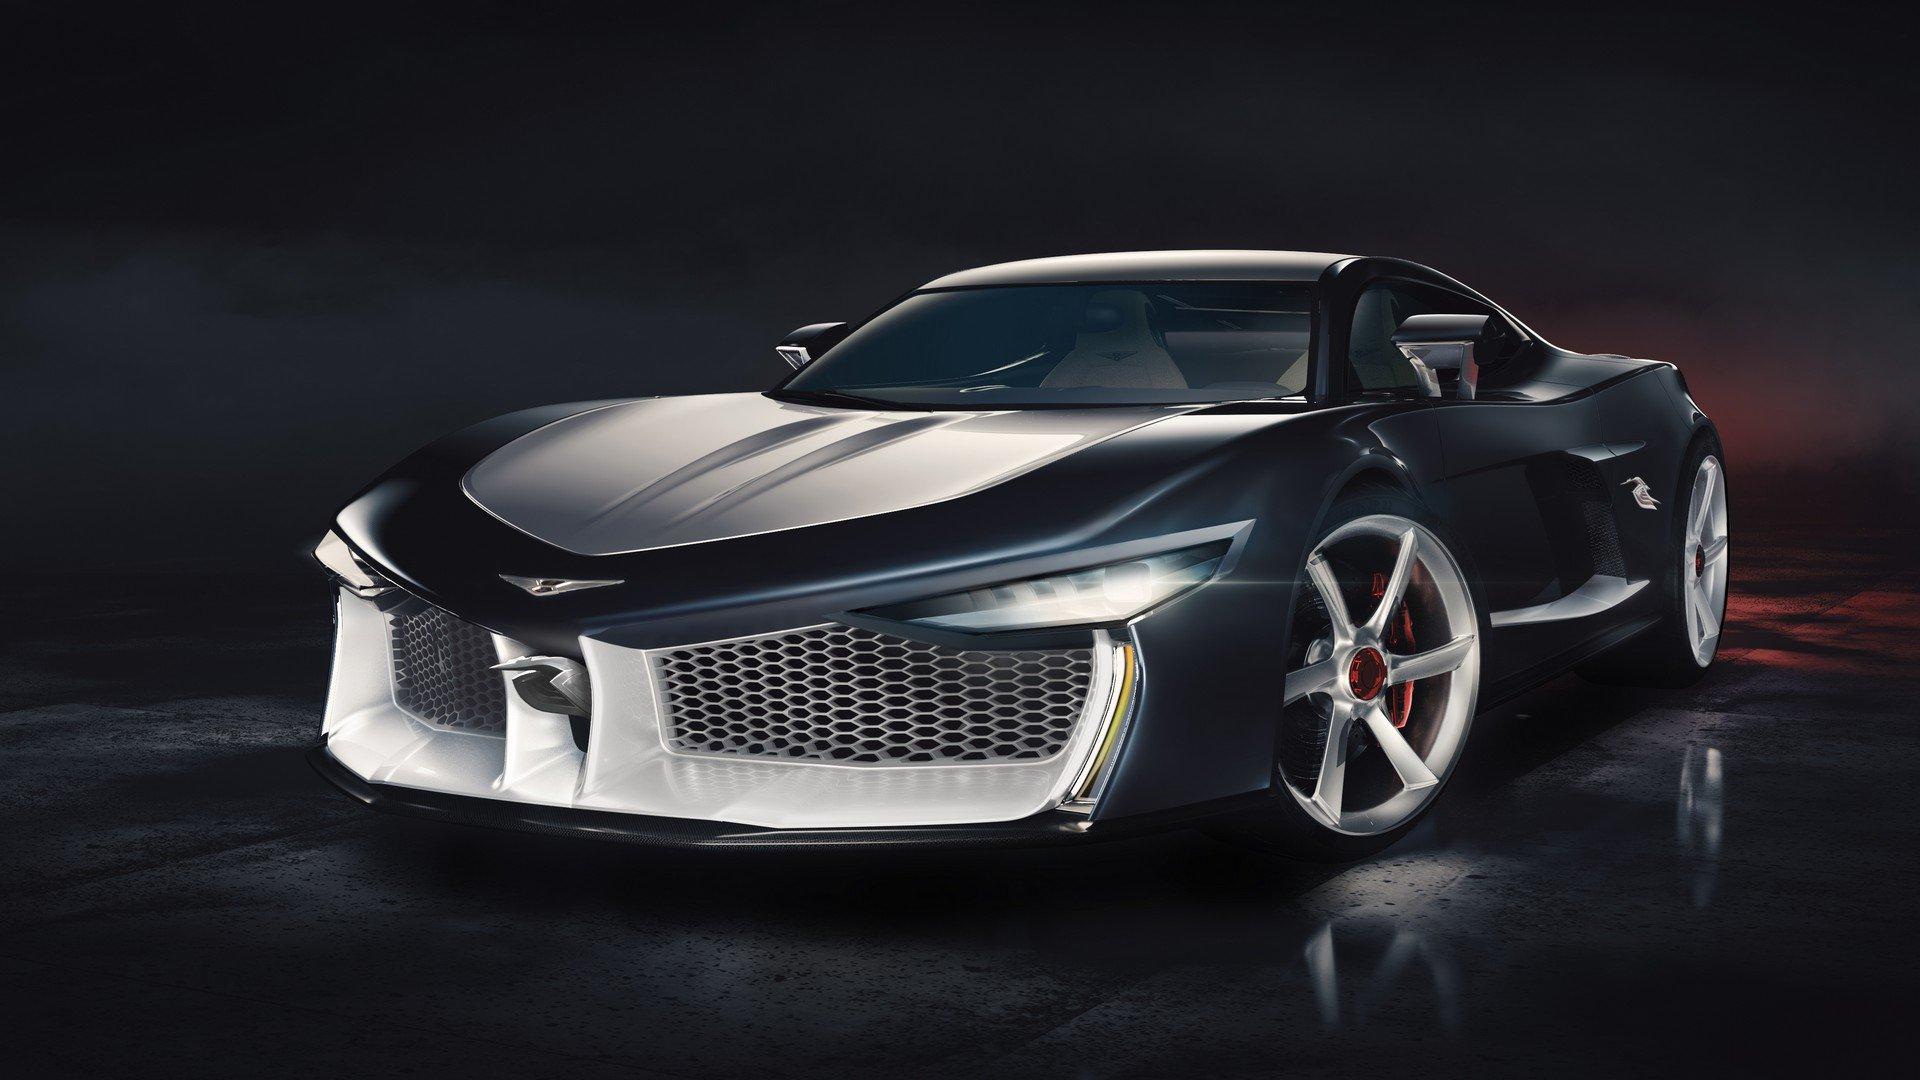 https: img-k.okeinfo.net content 2019 03 08 15 2027563 bukan-merek-terkenal-hypercar-ini-semburkan-tenaga-mesin-1-070-hp-7Pn3DhupQY.jpg